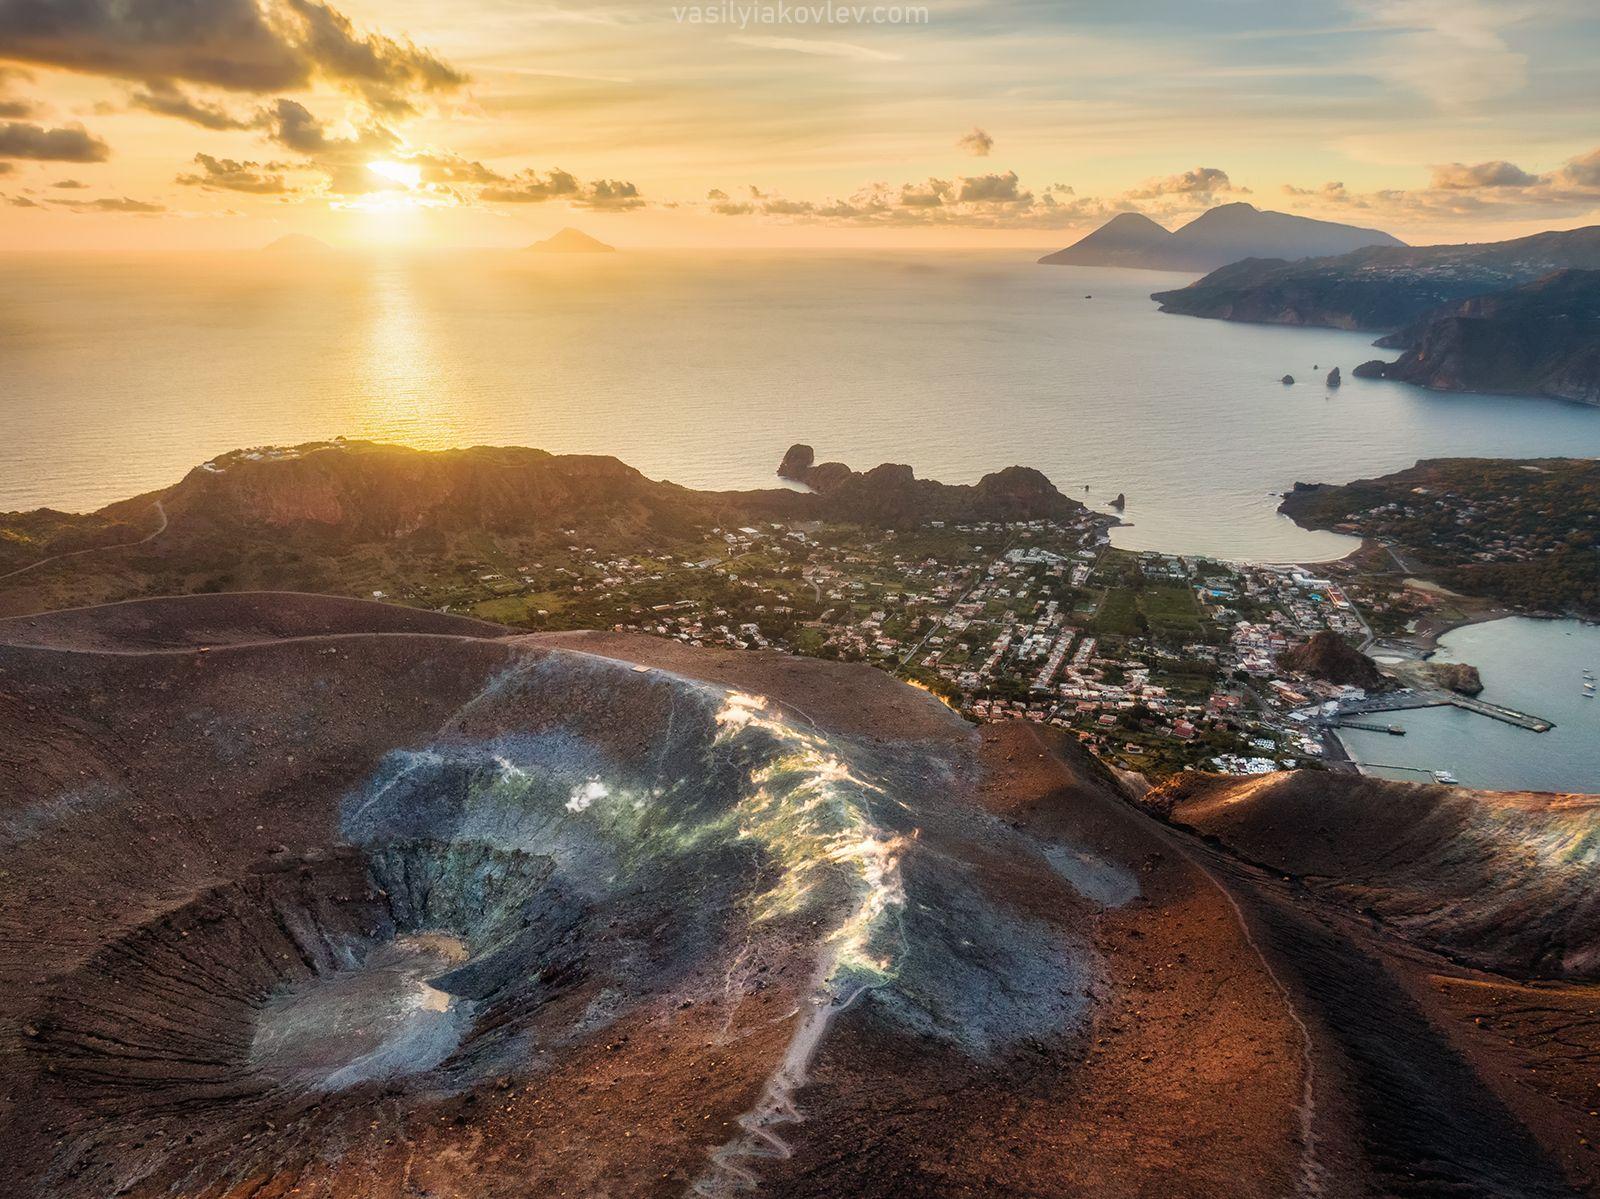 Остров Вулкано сицилия италия фототур яковлевфототур василийяковлев